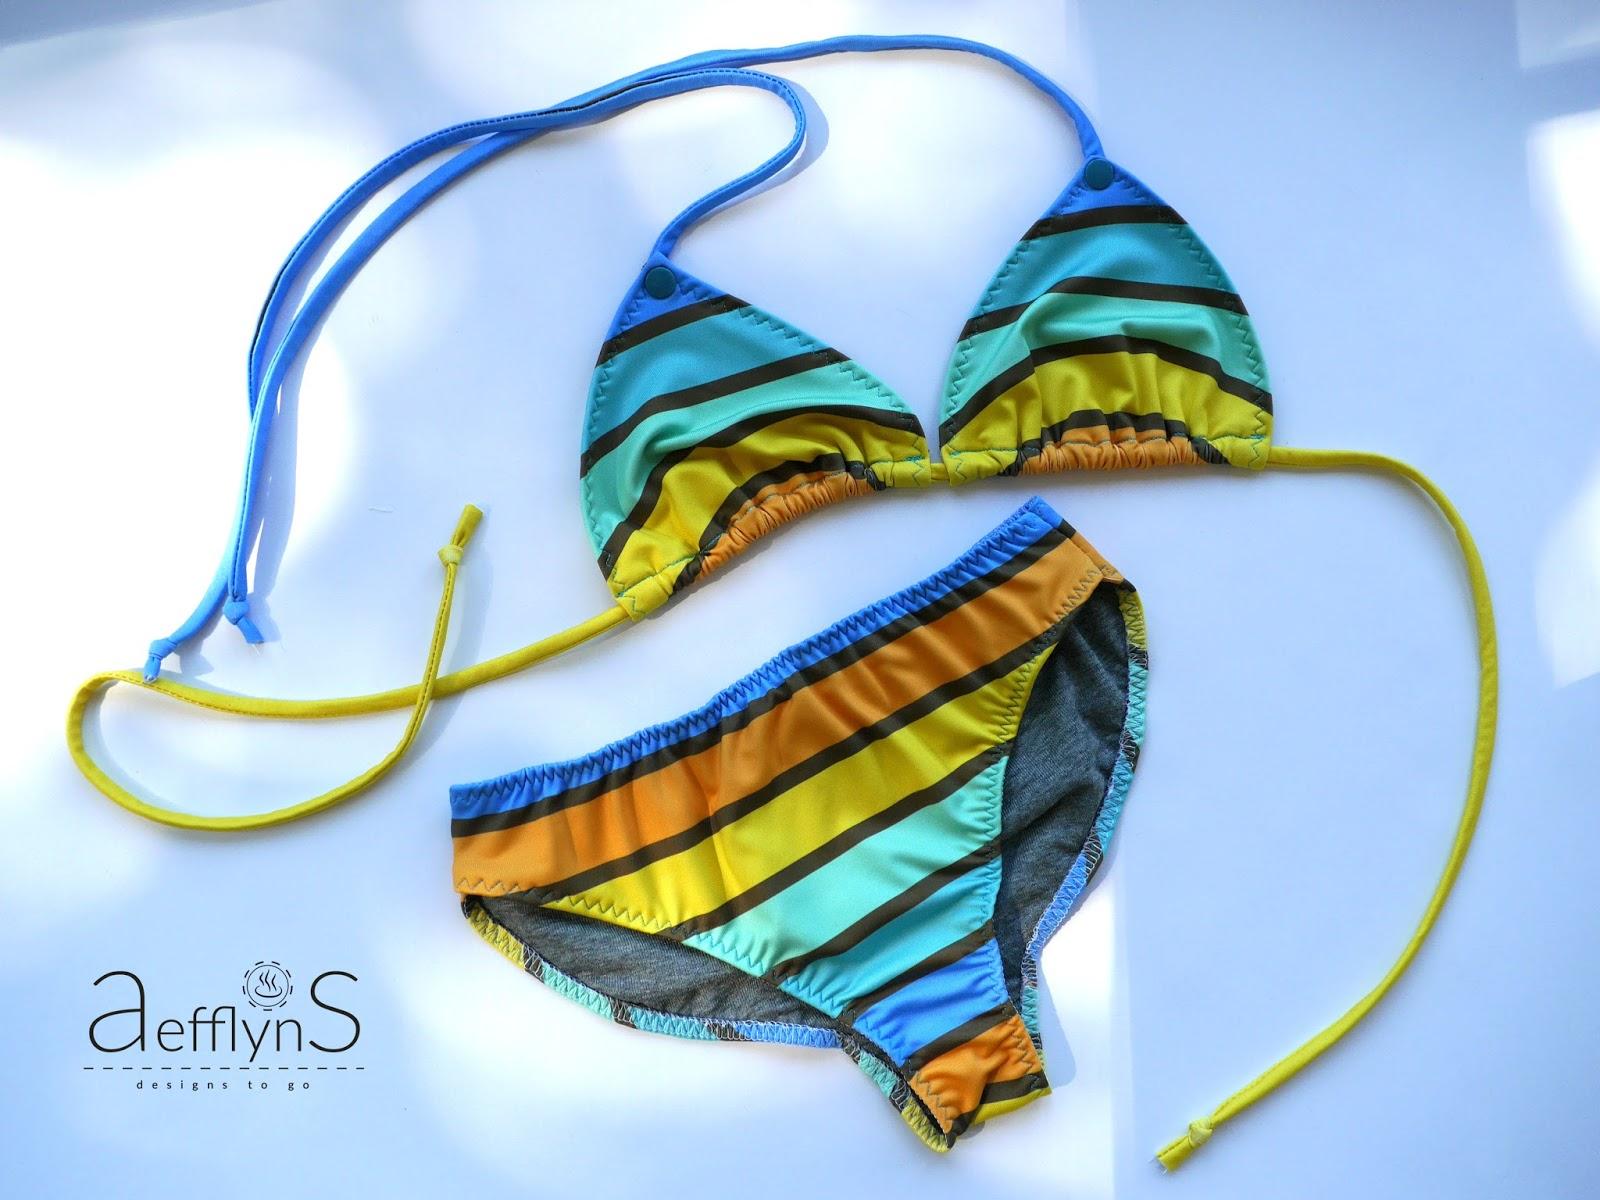 aefflynS - to go: Bikini DIY - nähen mit Lycra